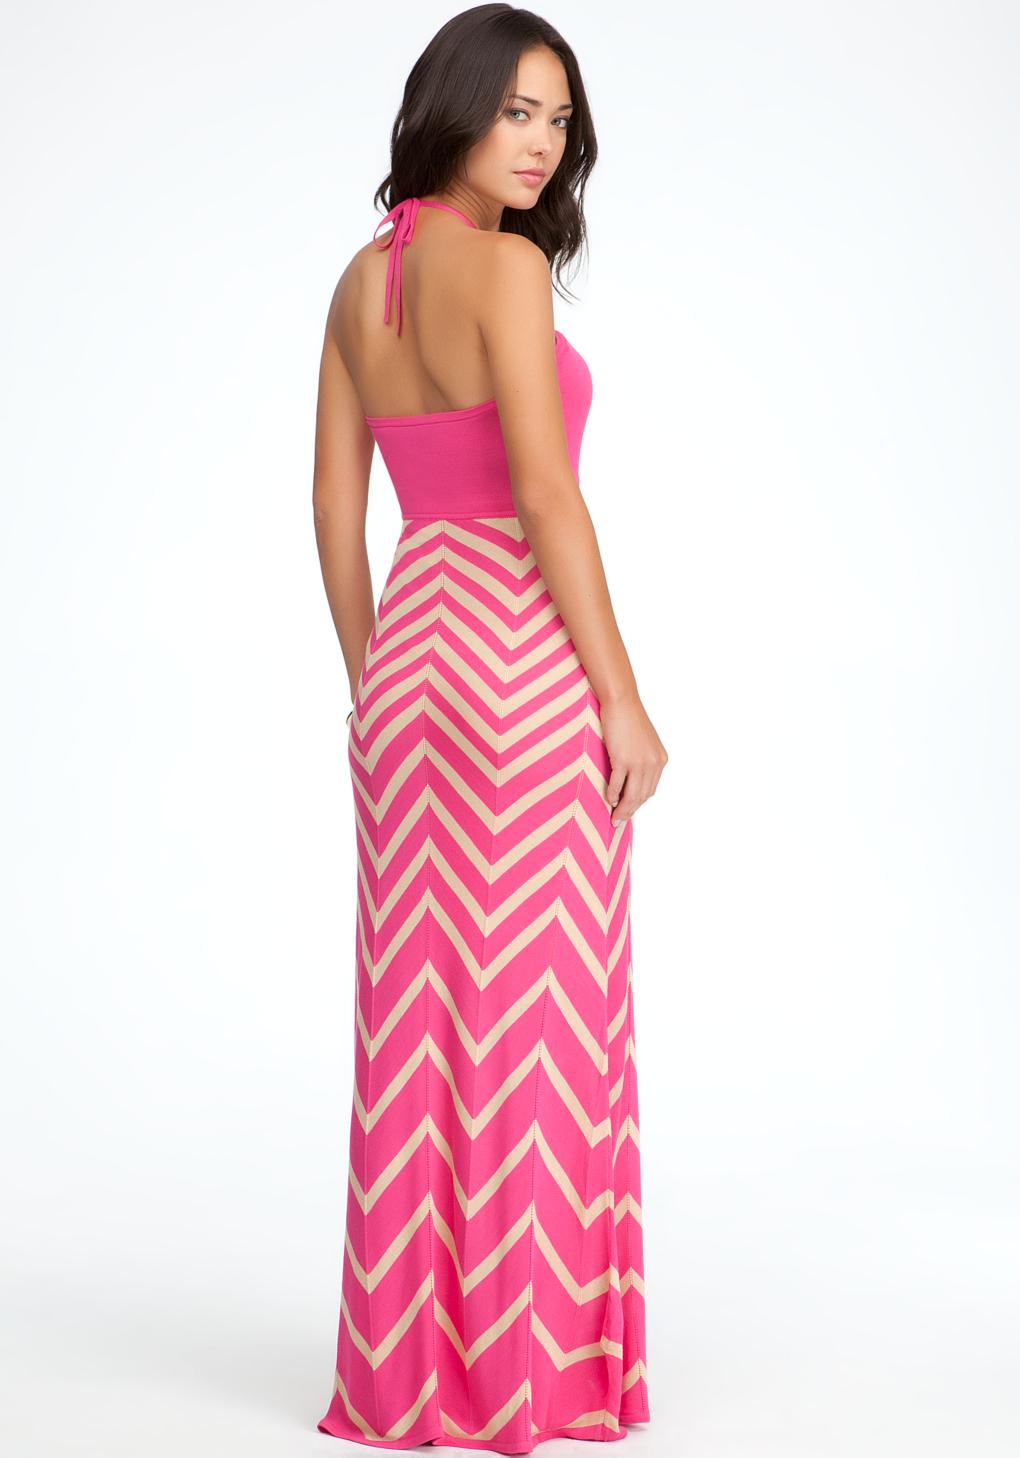 Chevron Halter Maxi Dress